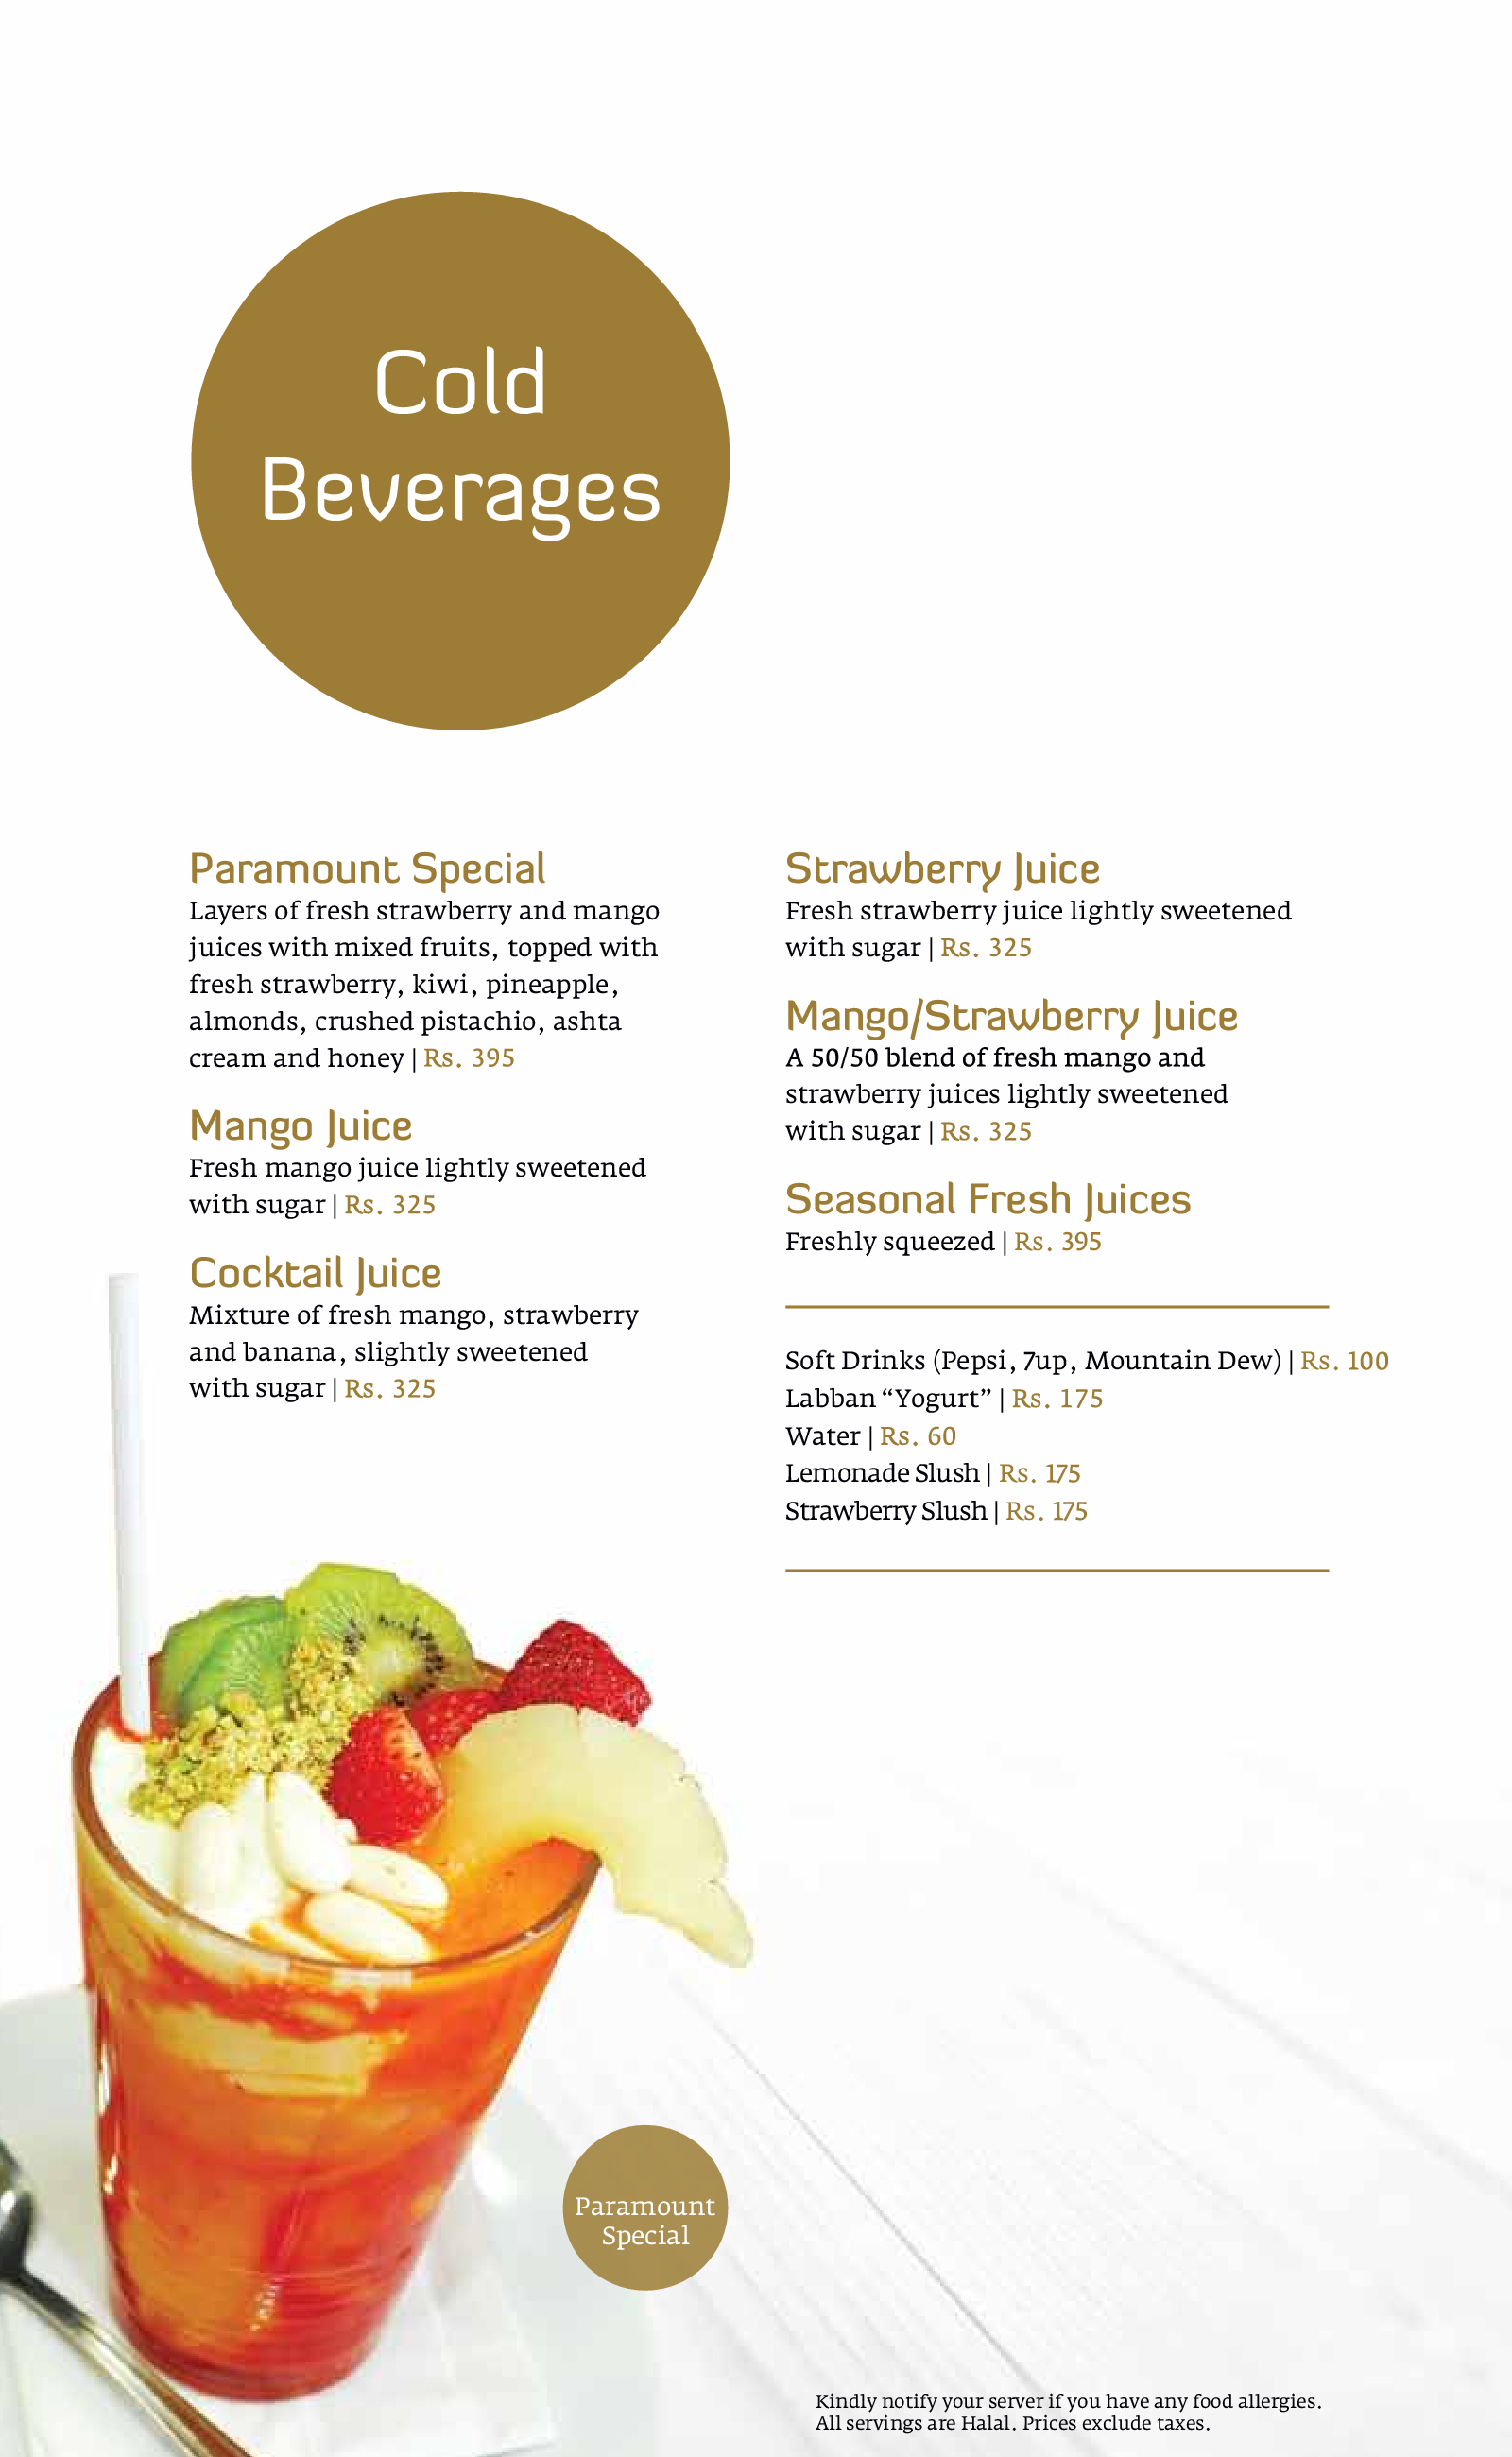 010-insert-menu-beverages-f-cs6_pk